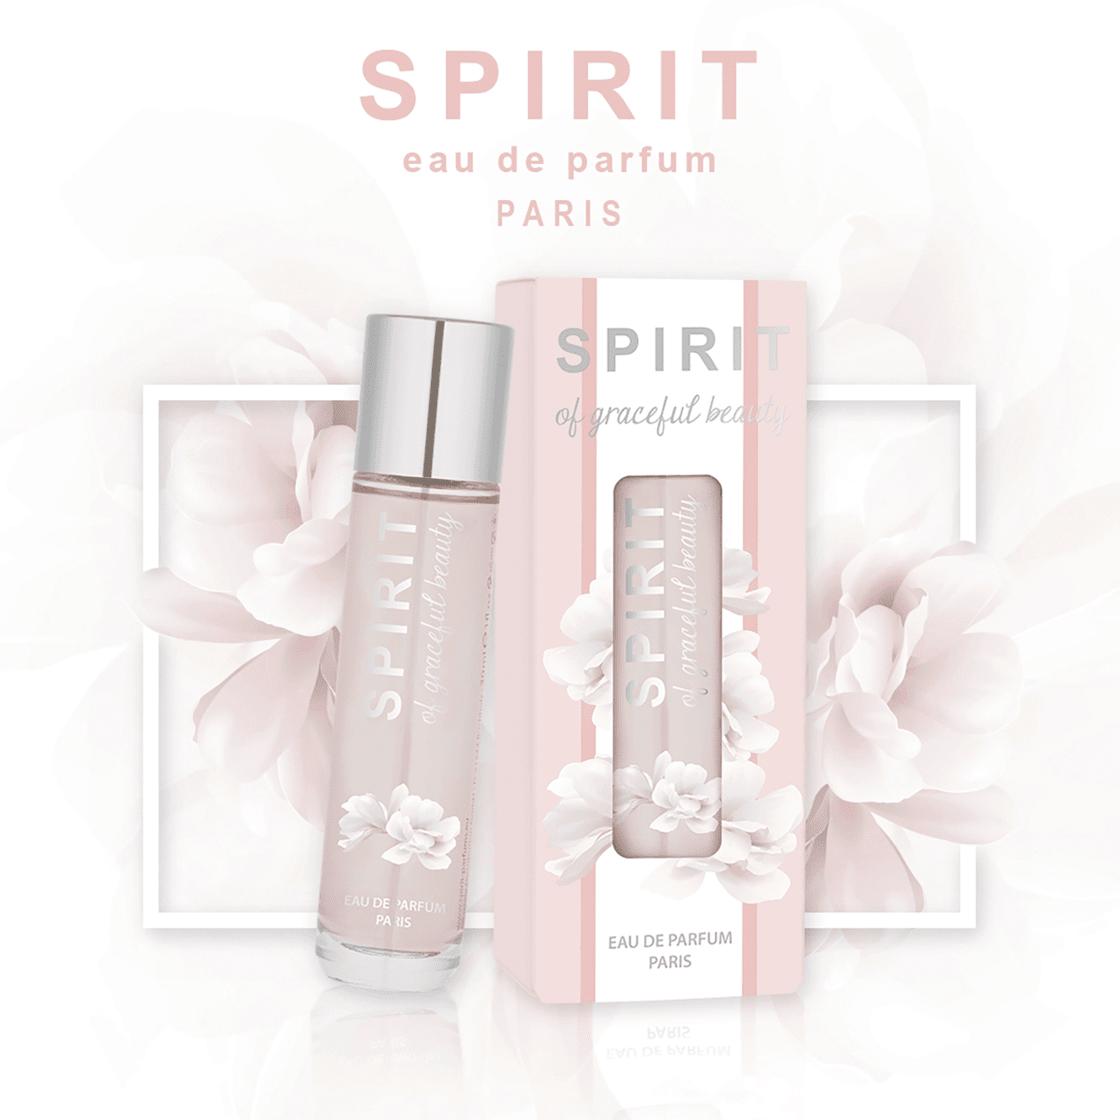 Женские духи Spirit of Eau de Parfum of graceful beauty, 30 мл.